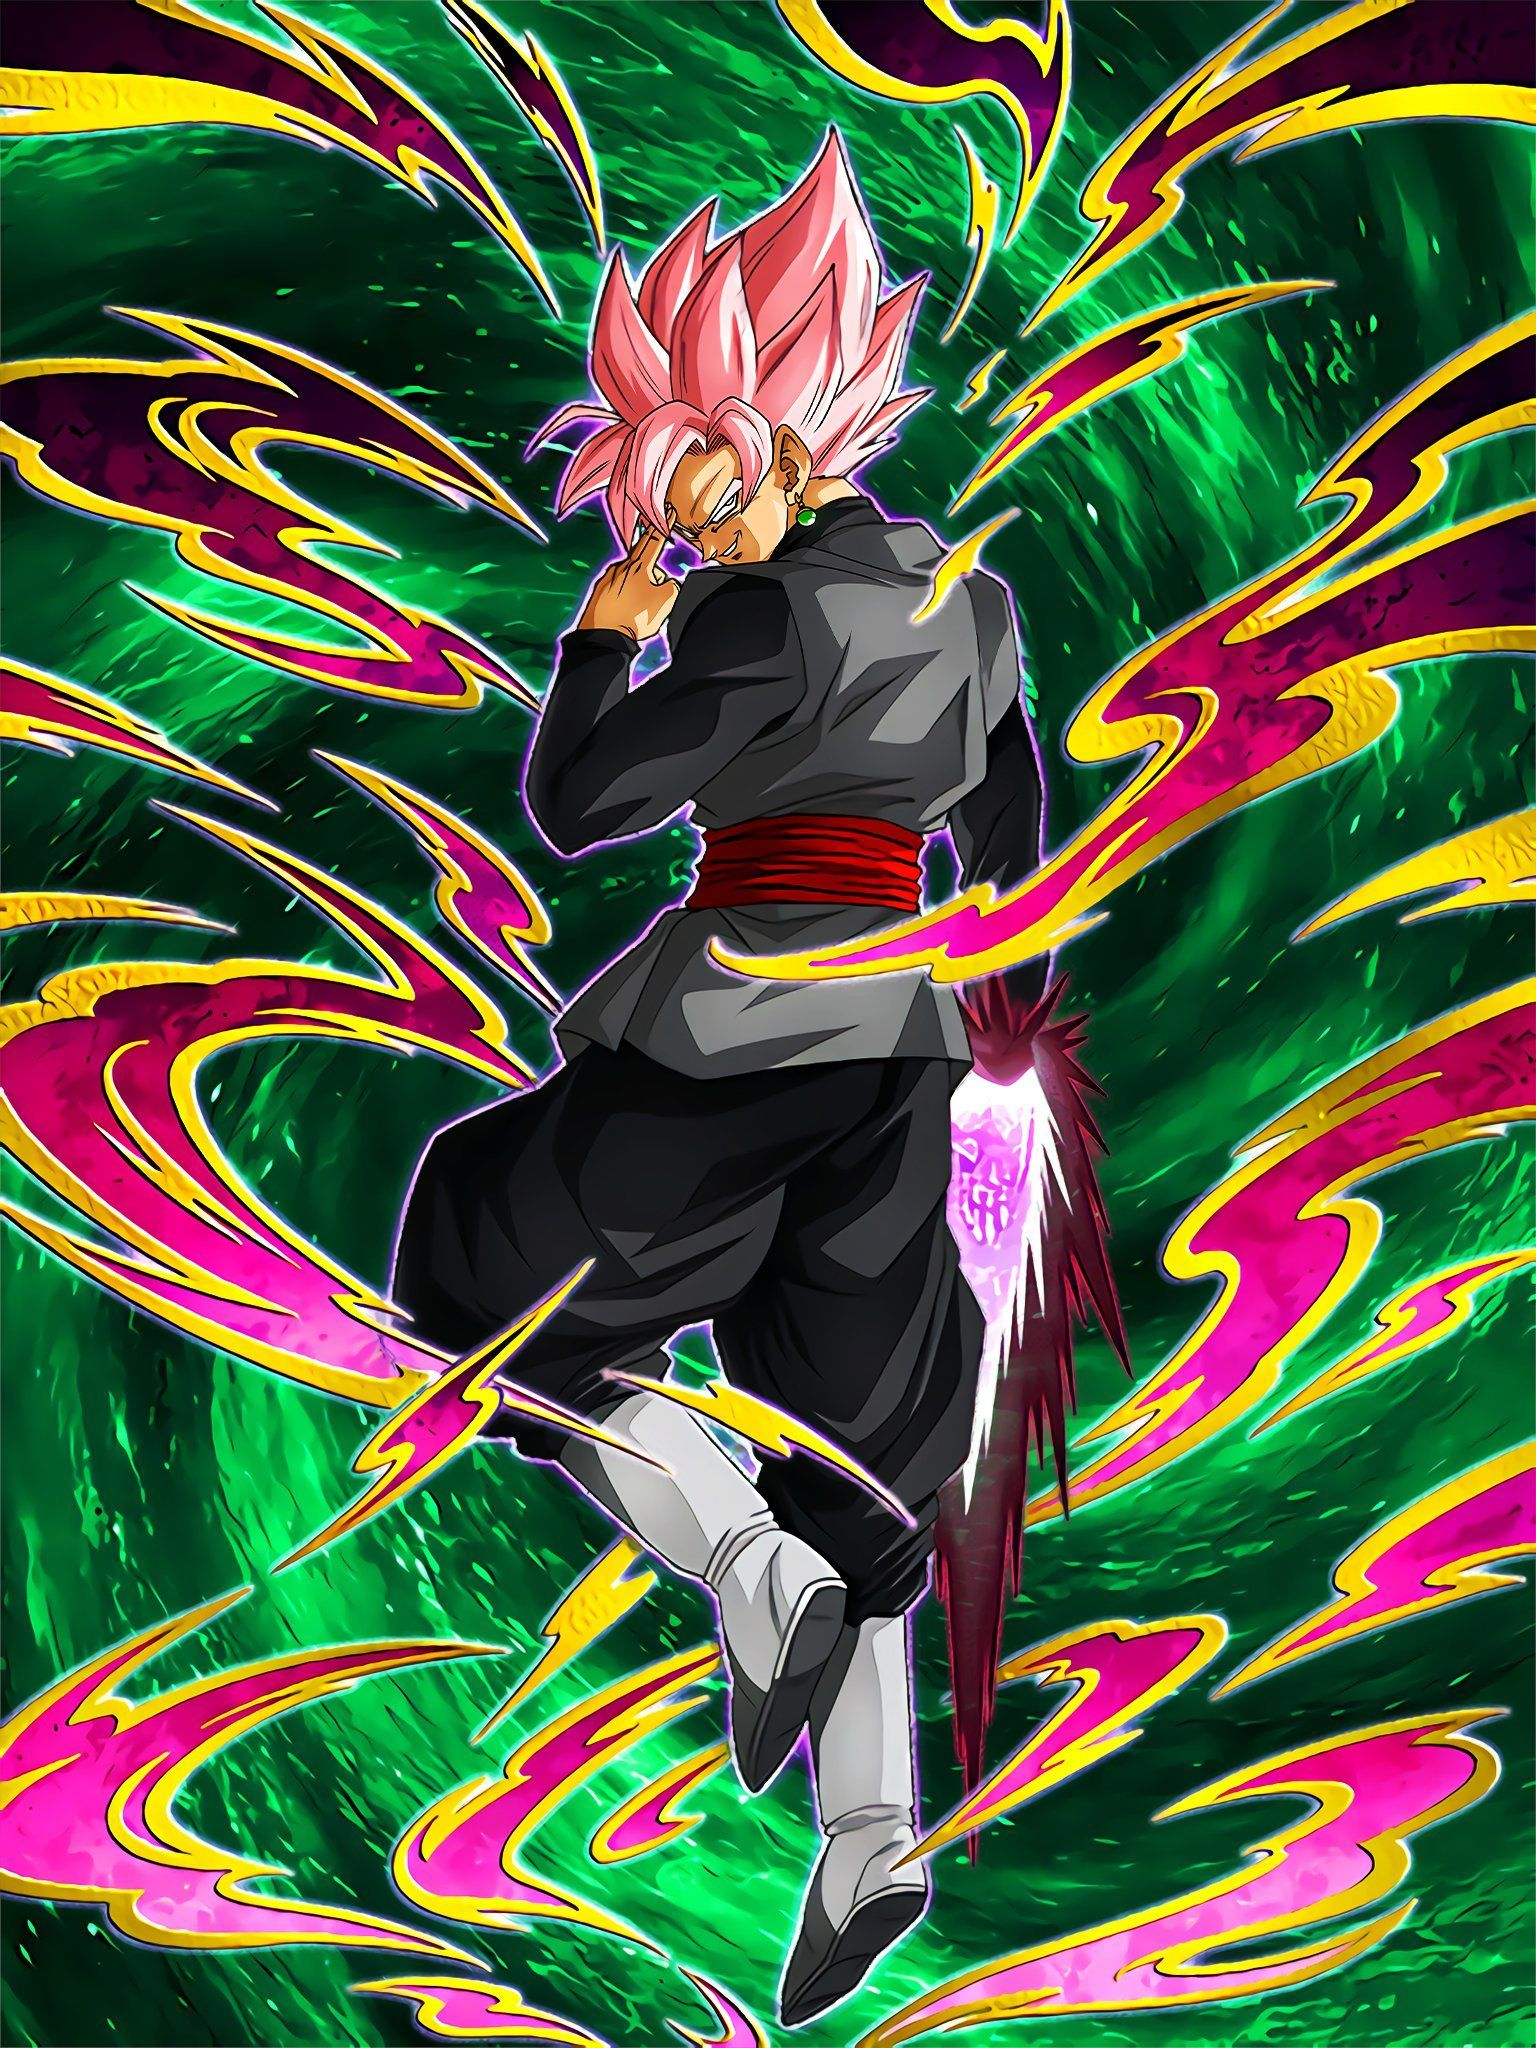 New Lr Goku Black Rose Ssr Art Dokkanbattle Desire For New Power Goku Black Super Saiyan Rose Anime Dragon Ball Super Anime Dragon Ball Super Saiyan Rose